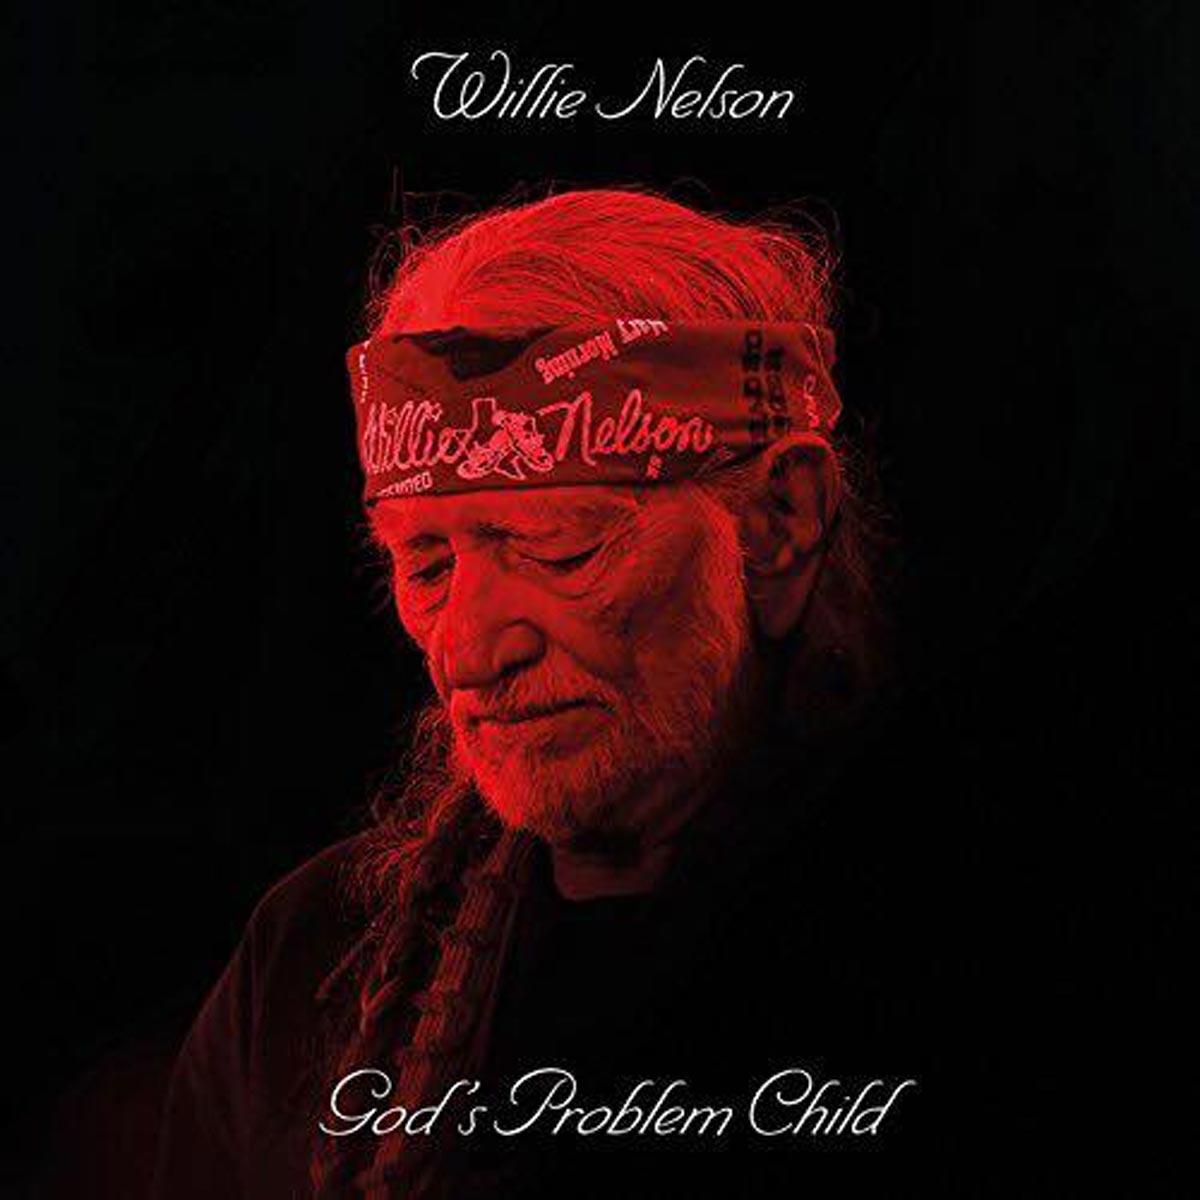 WILLIE NELSON - God's Problem Child